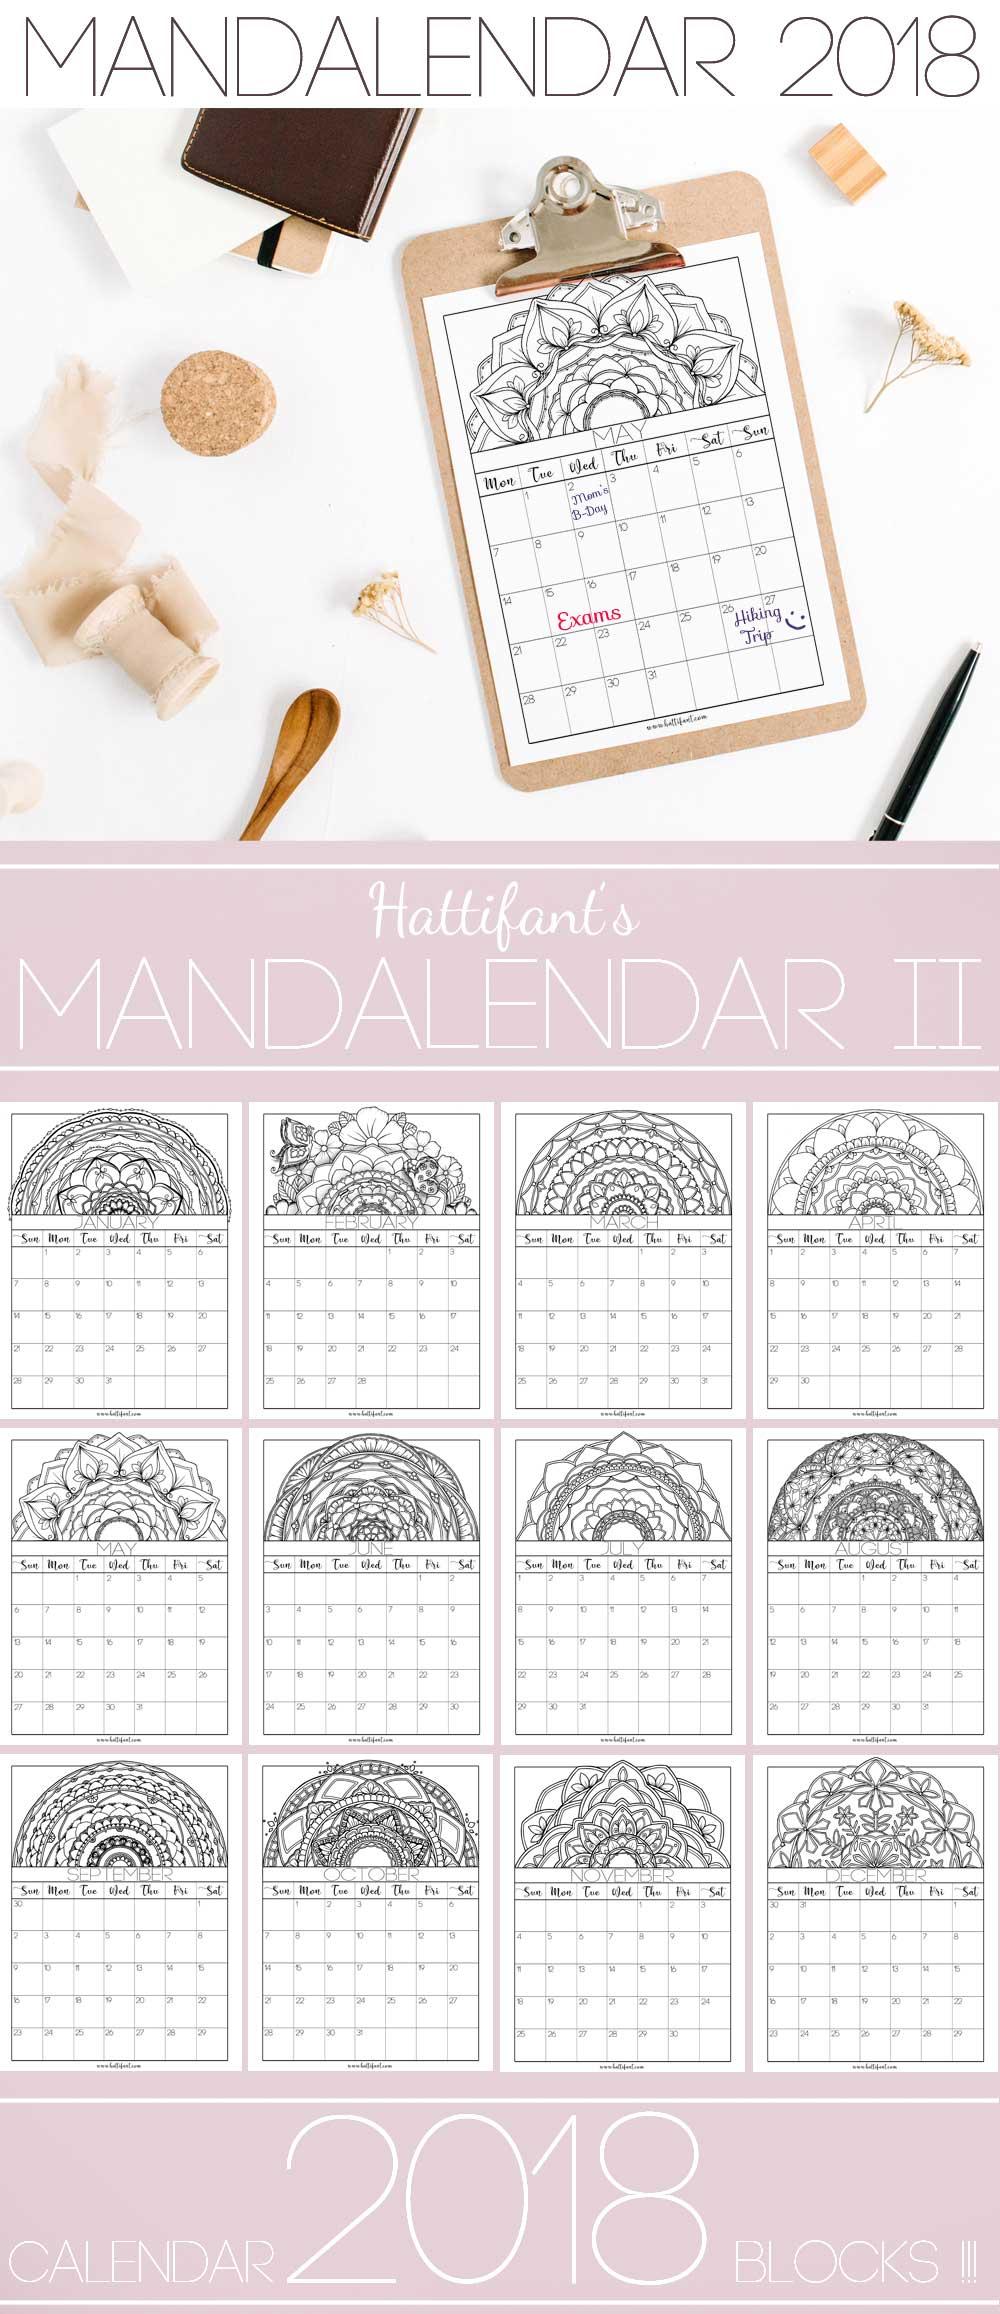 Hattifant's Mandalendar 2018 a Mandala Calendar to Color and Plan with